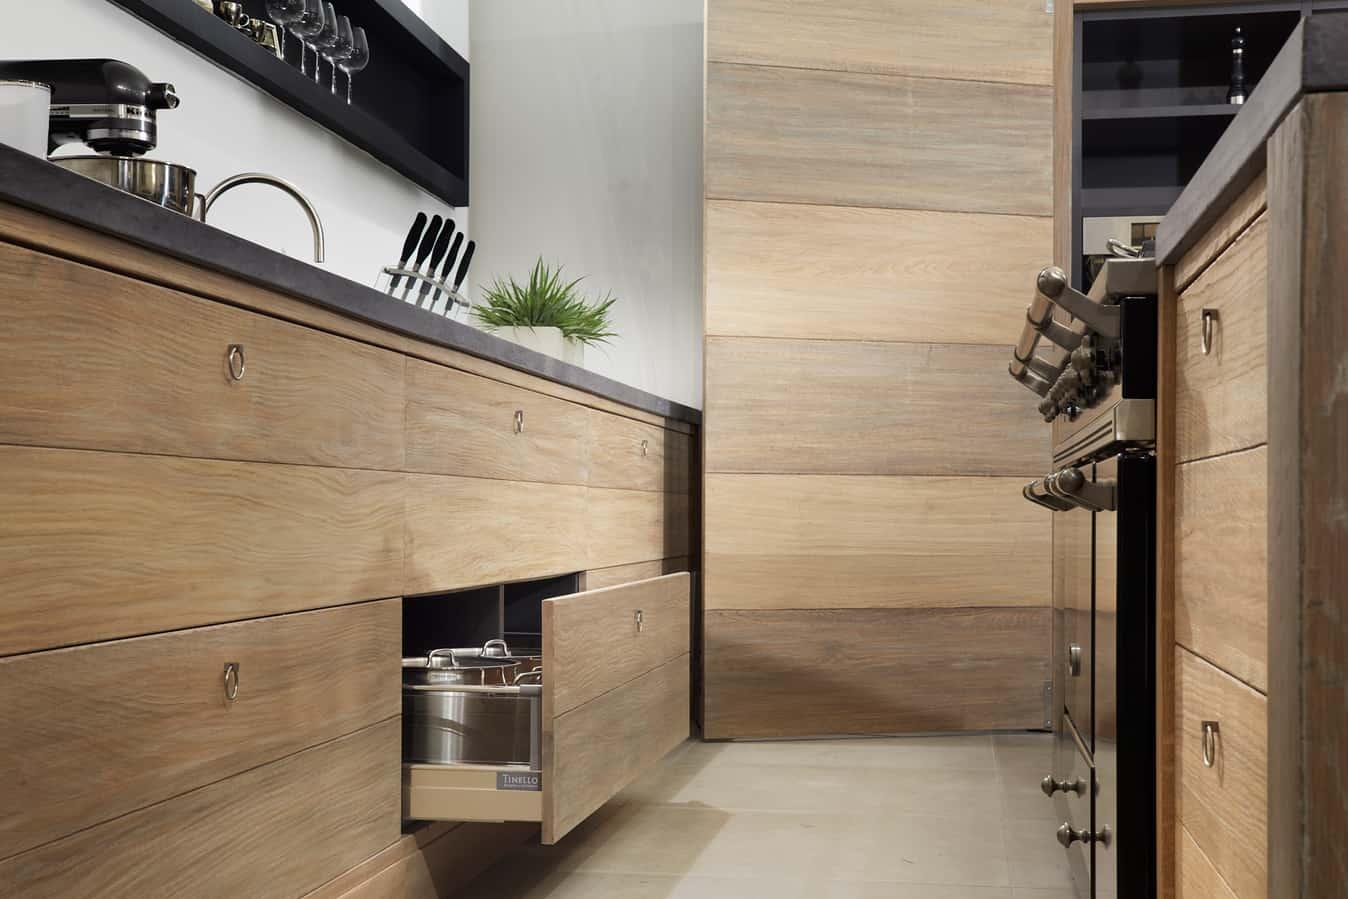 Houten keukenlade